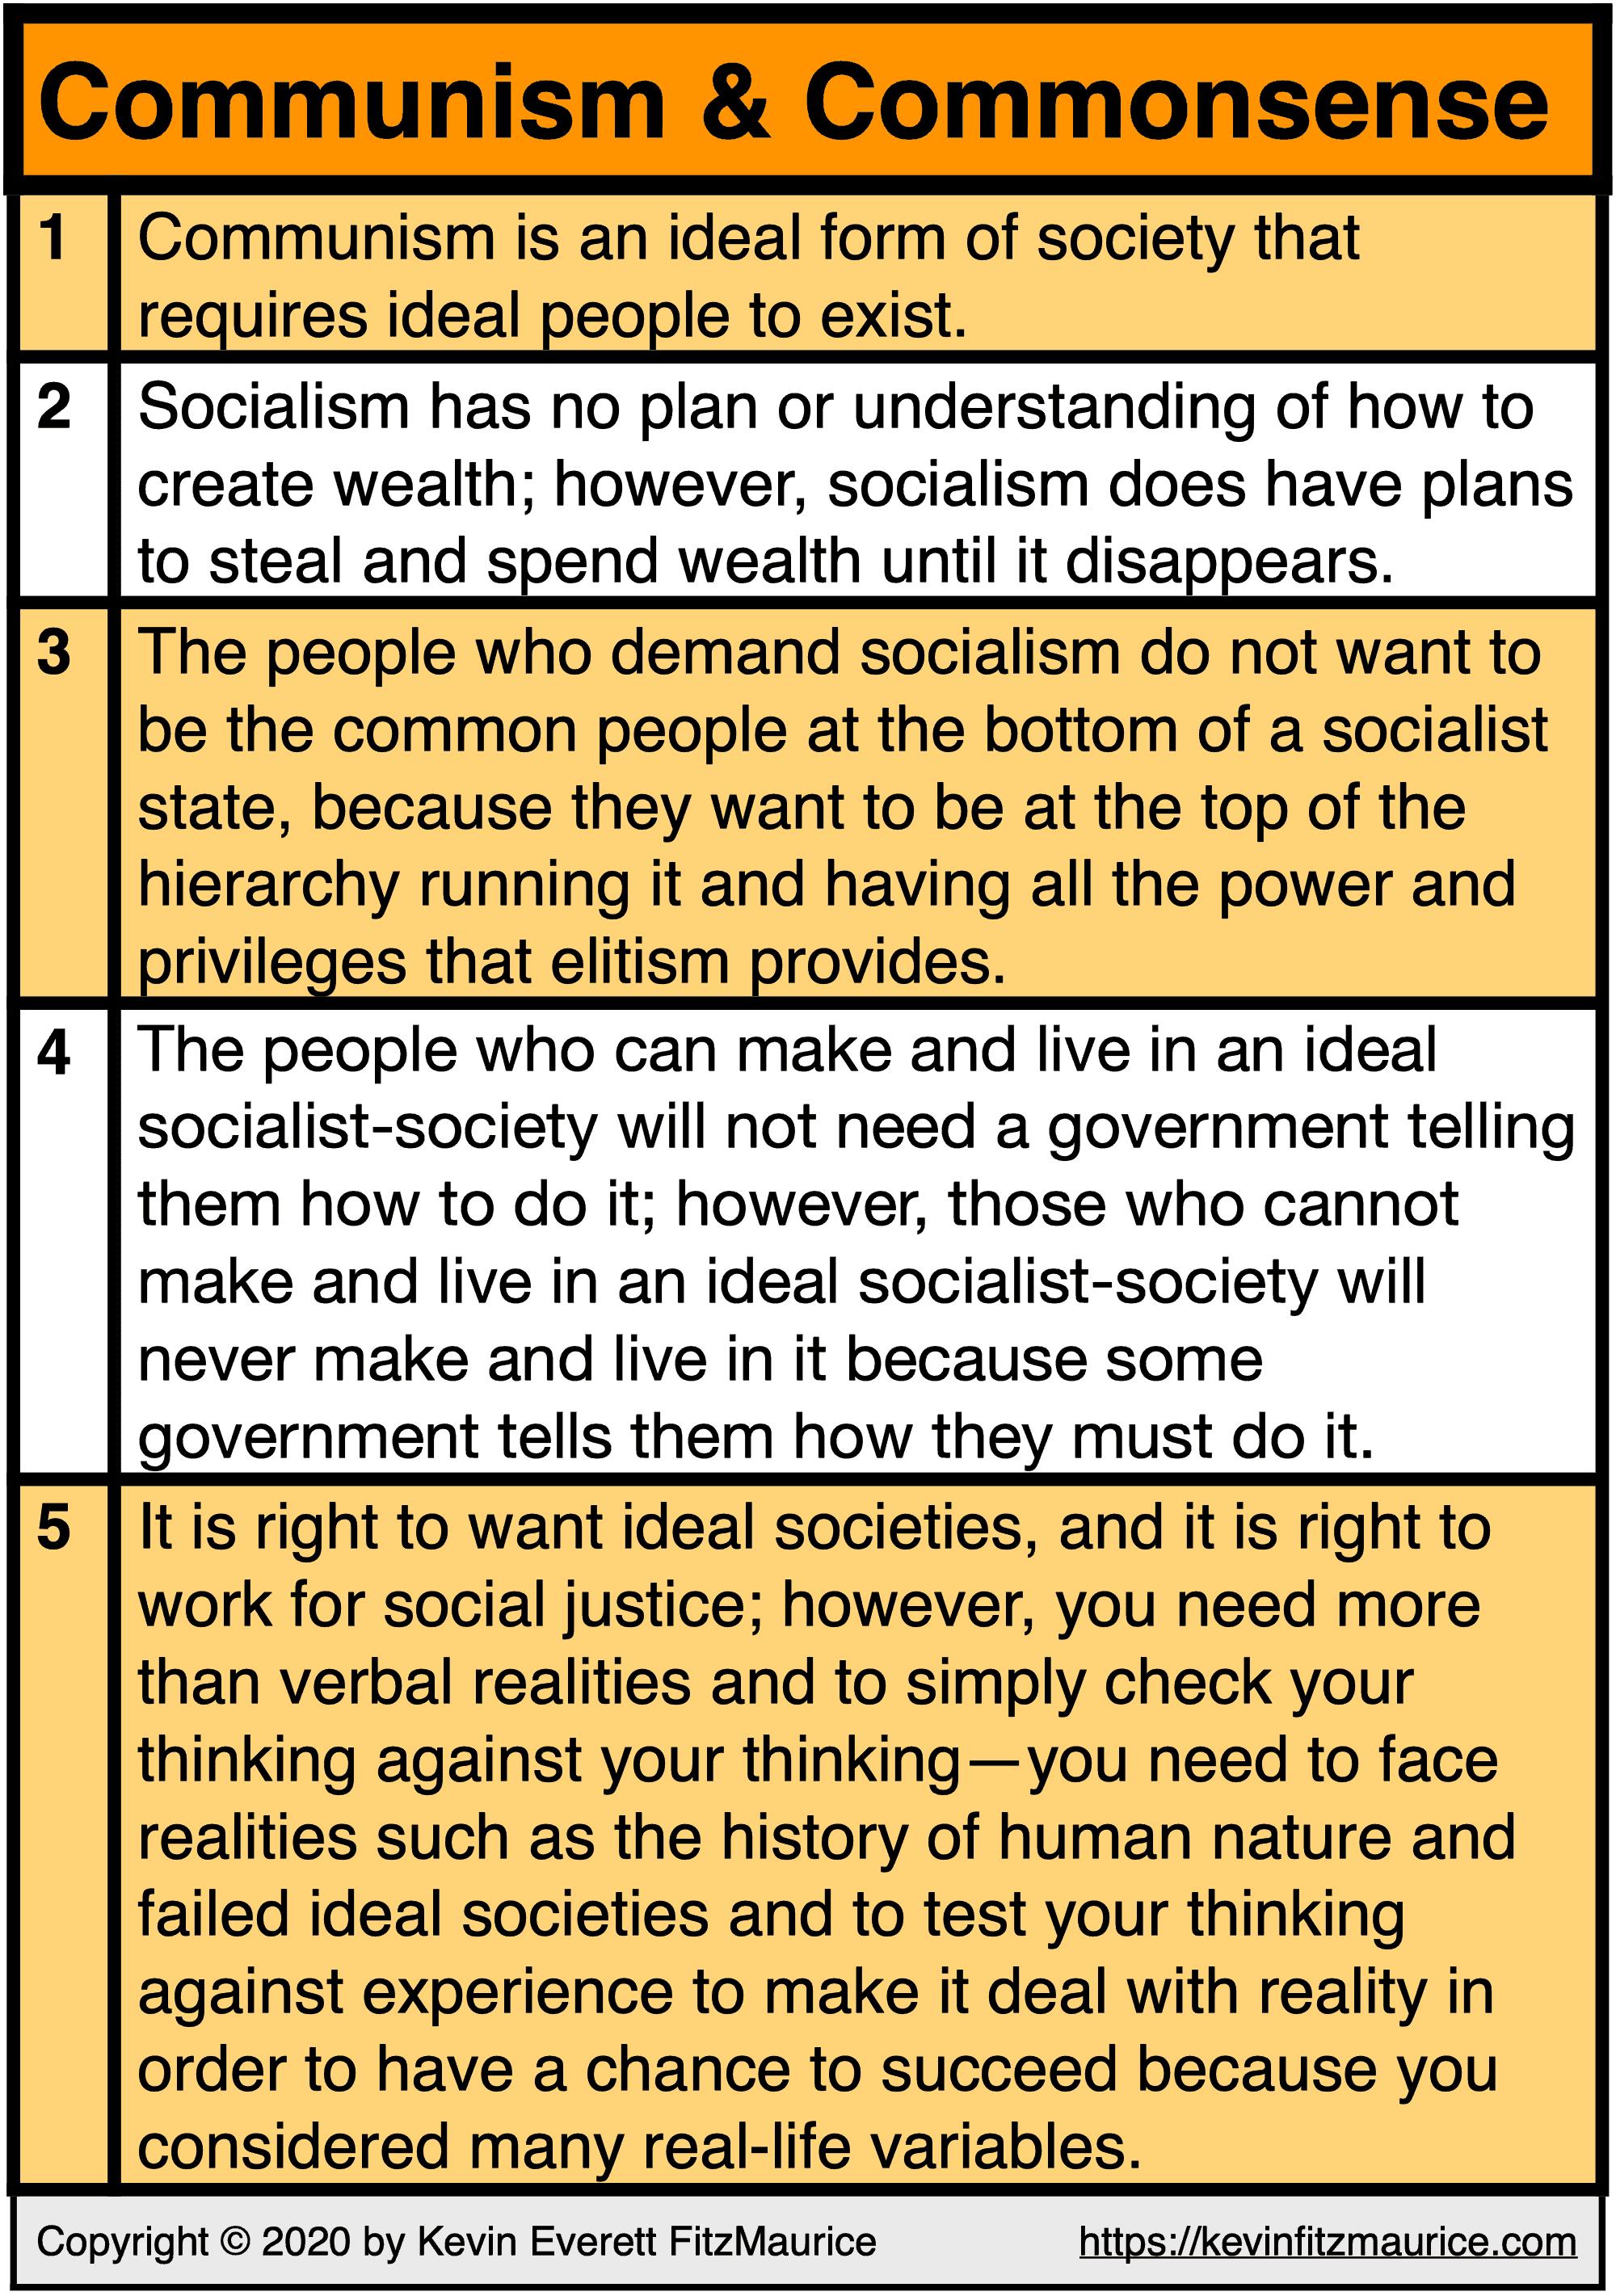 Communism & Commonsense